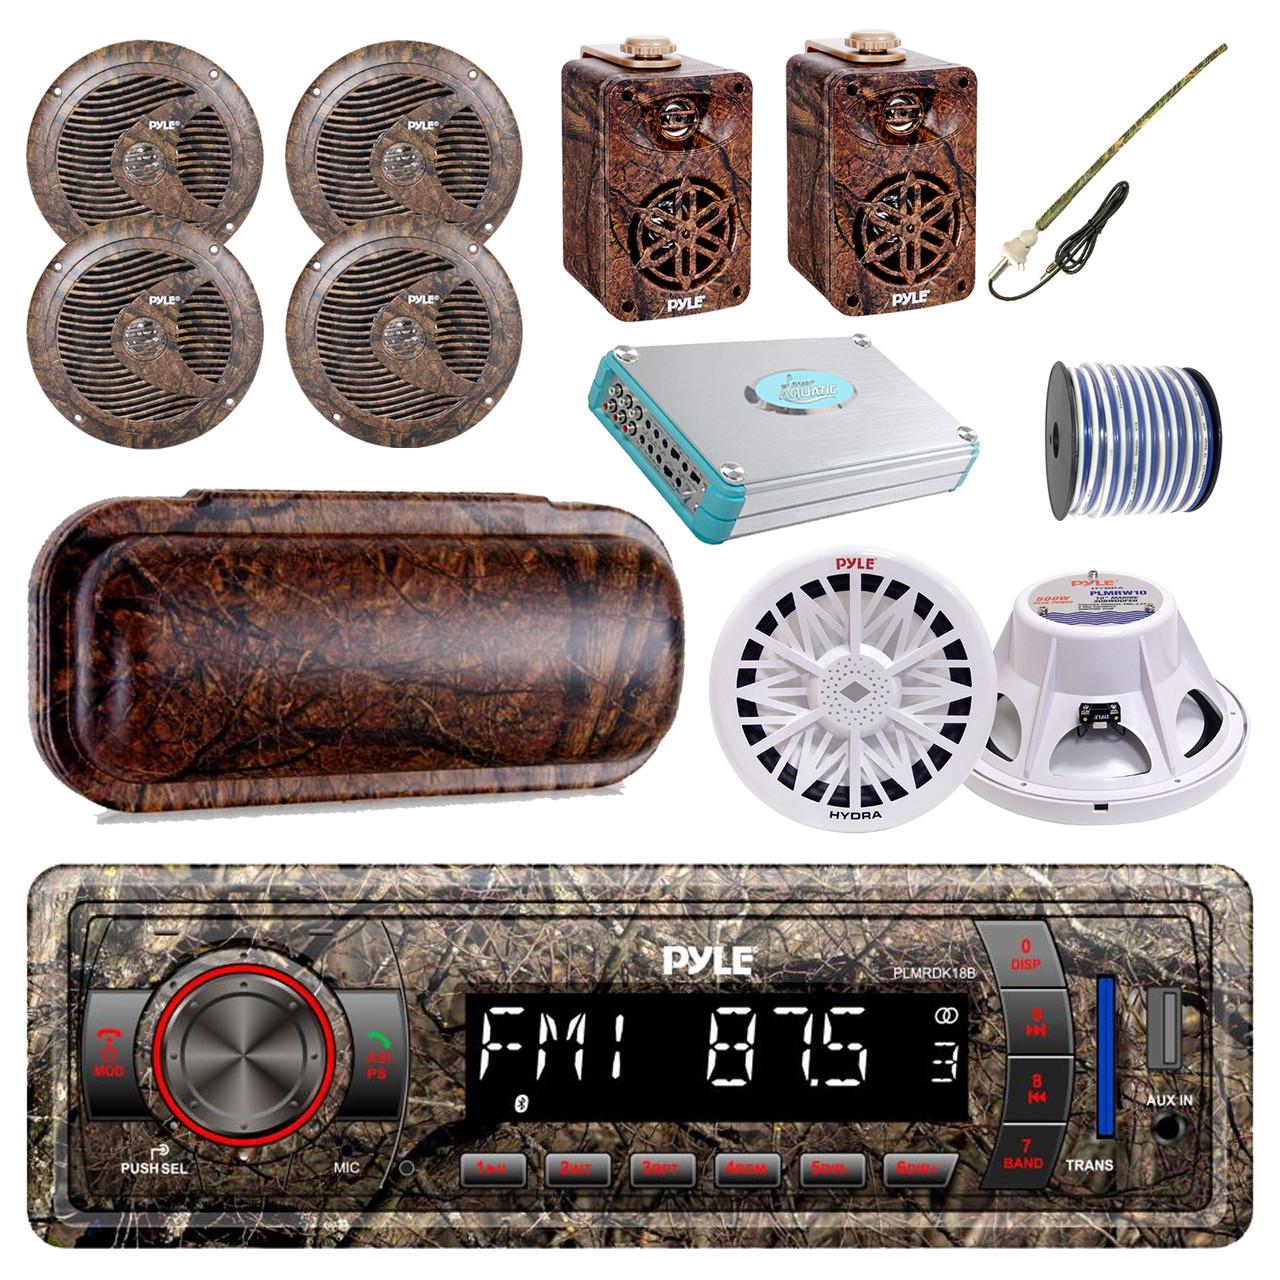 "Pyle Marine Bluetooth Camo Radio 2x 3.5"" Speakers 50 Ft Wire Cover Antenna"